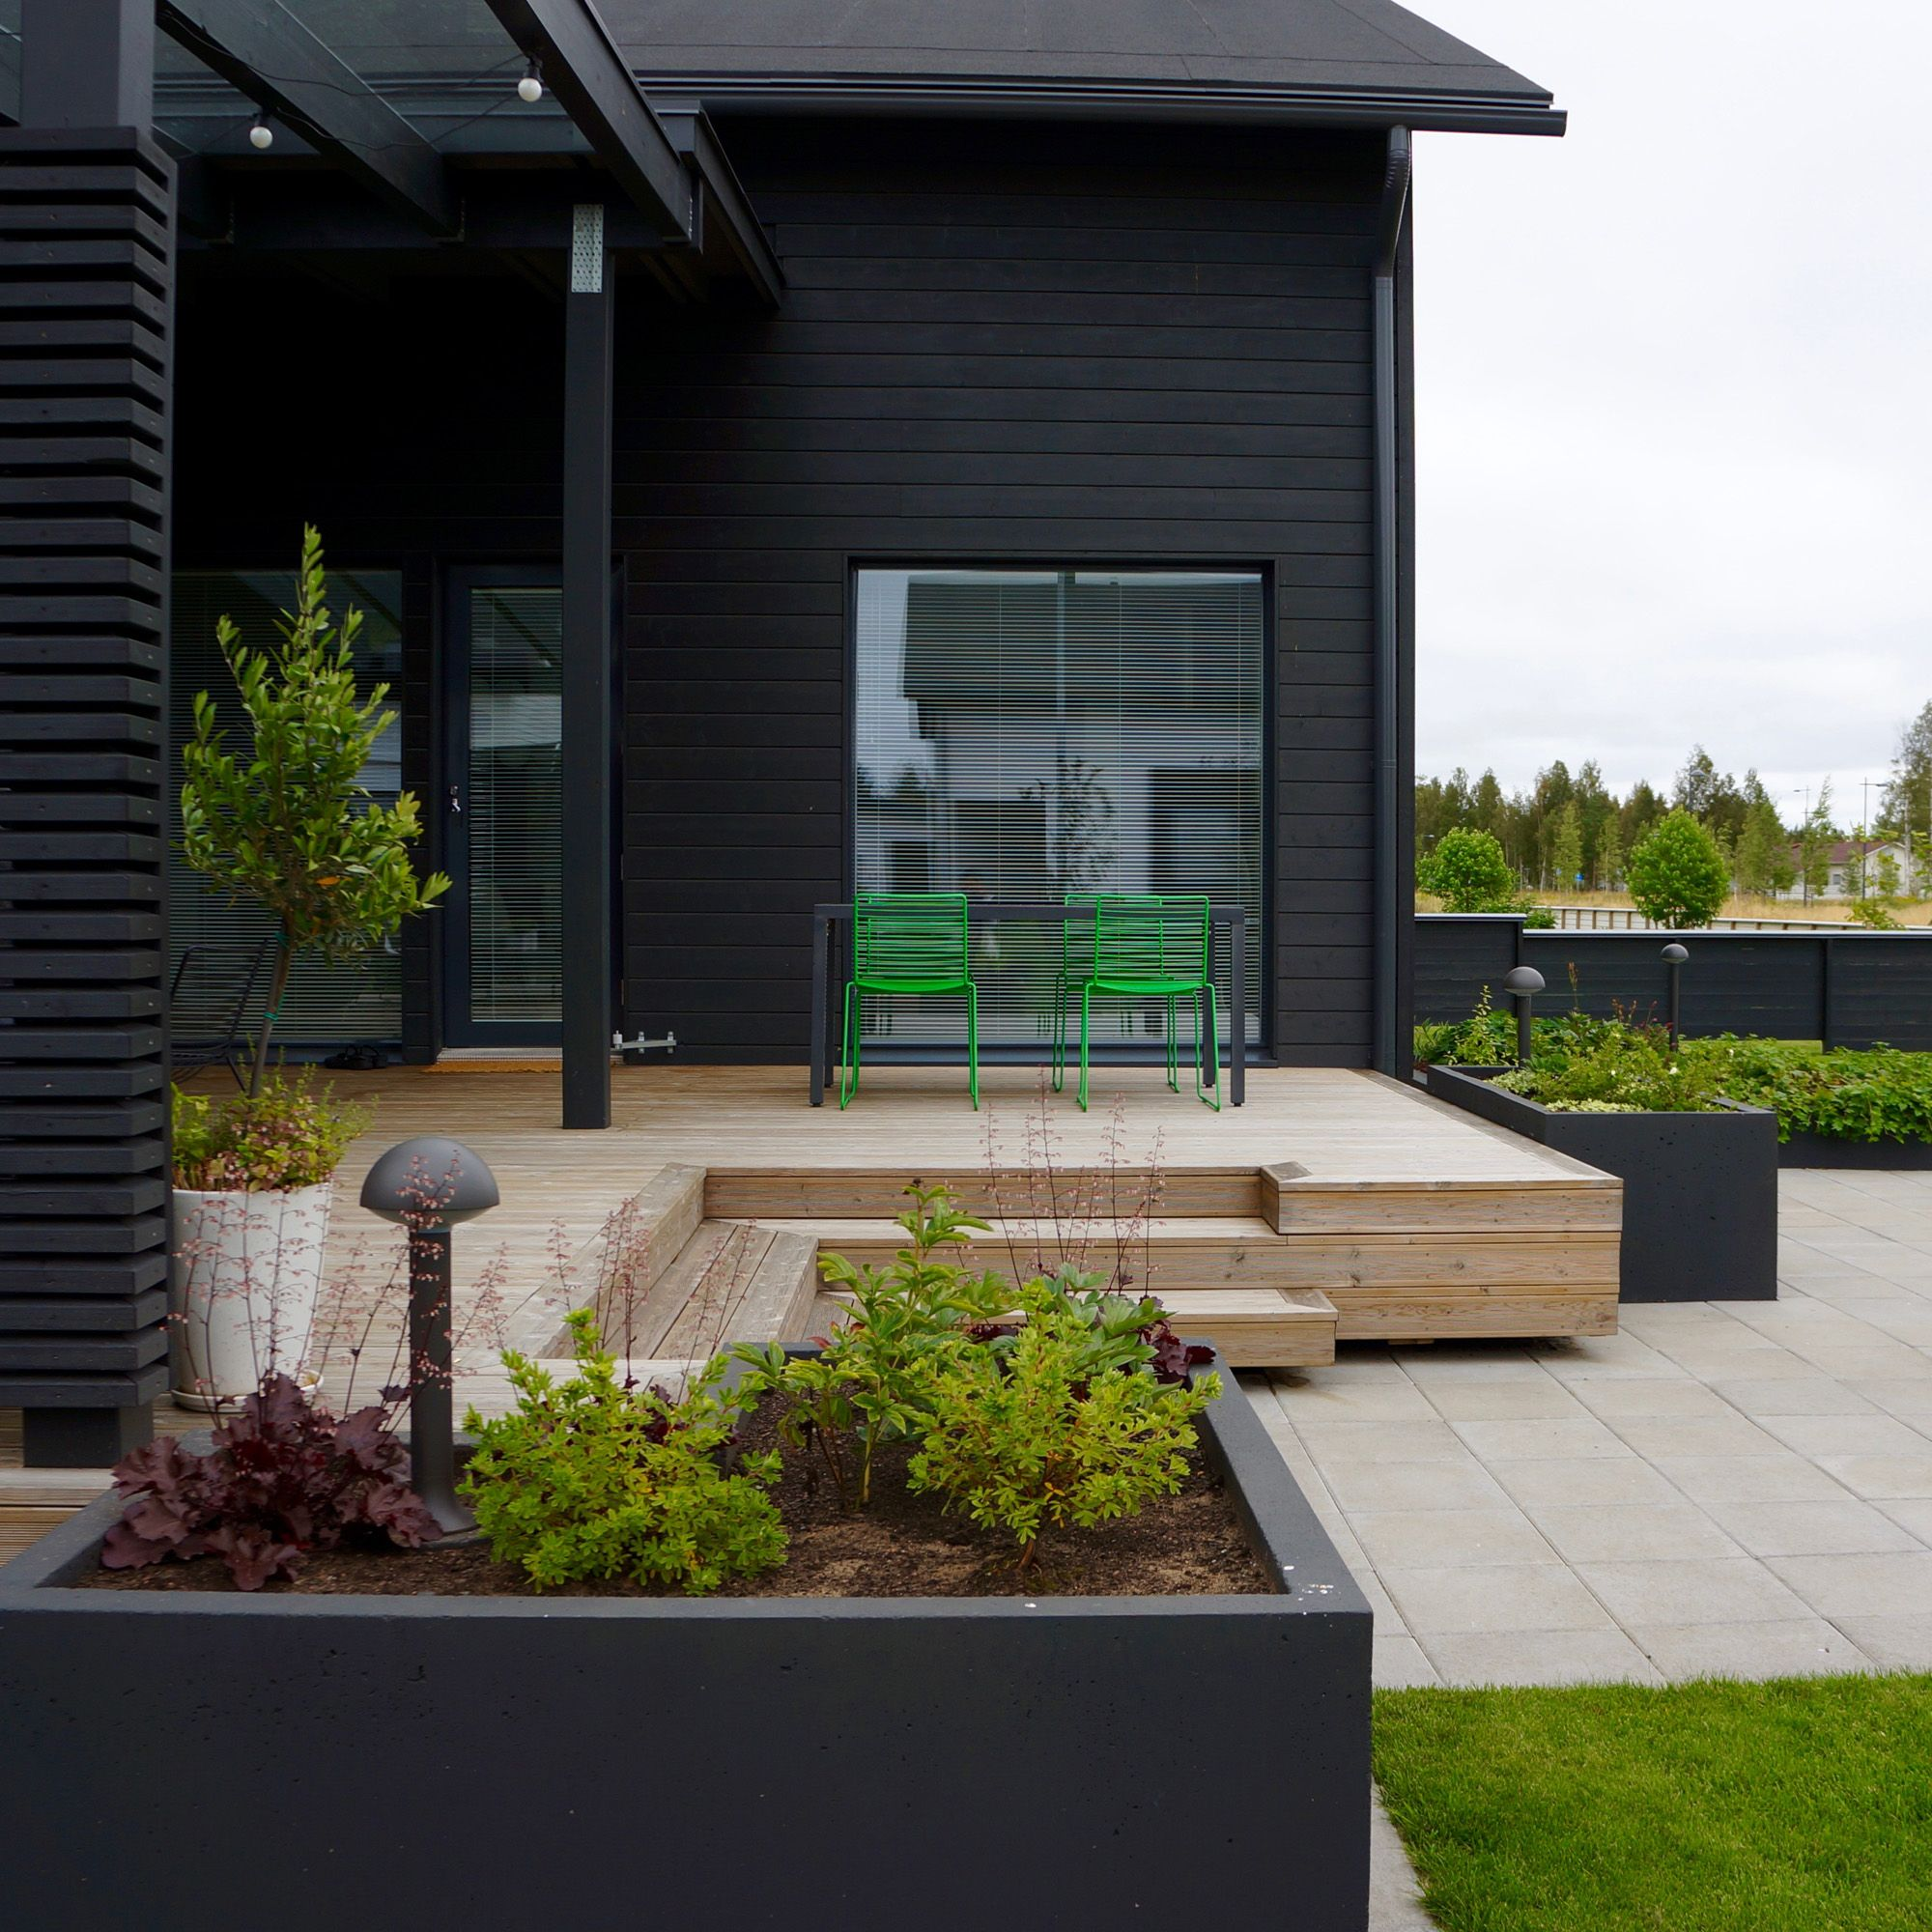 Outdoor Living Area Scandinavian Nordic Garden Design Designed By Green Idea Pihasuunnittelu Moderni Puutarha Terassi Puutarha